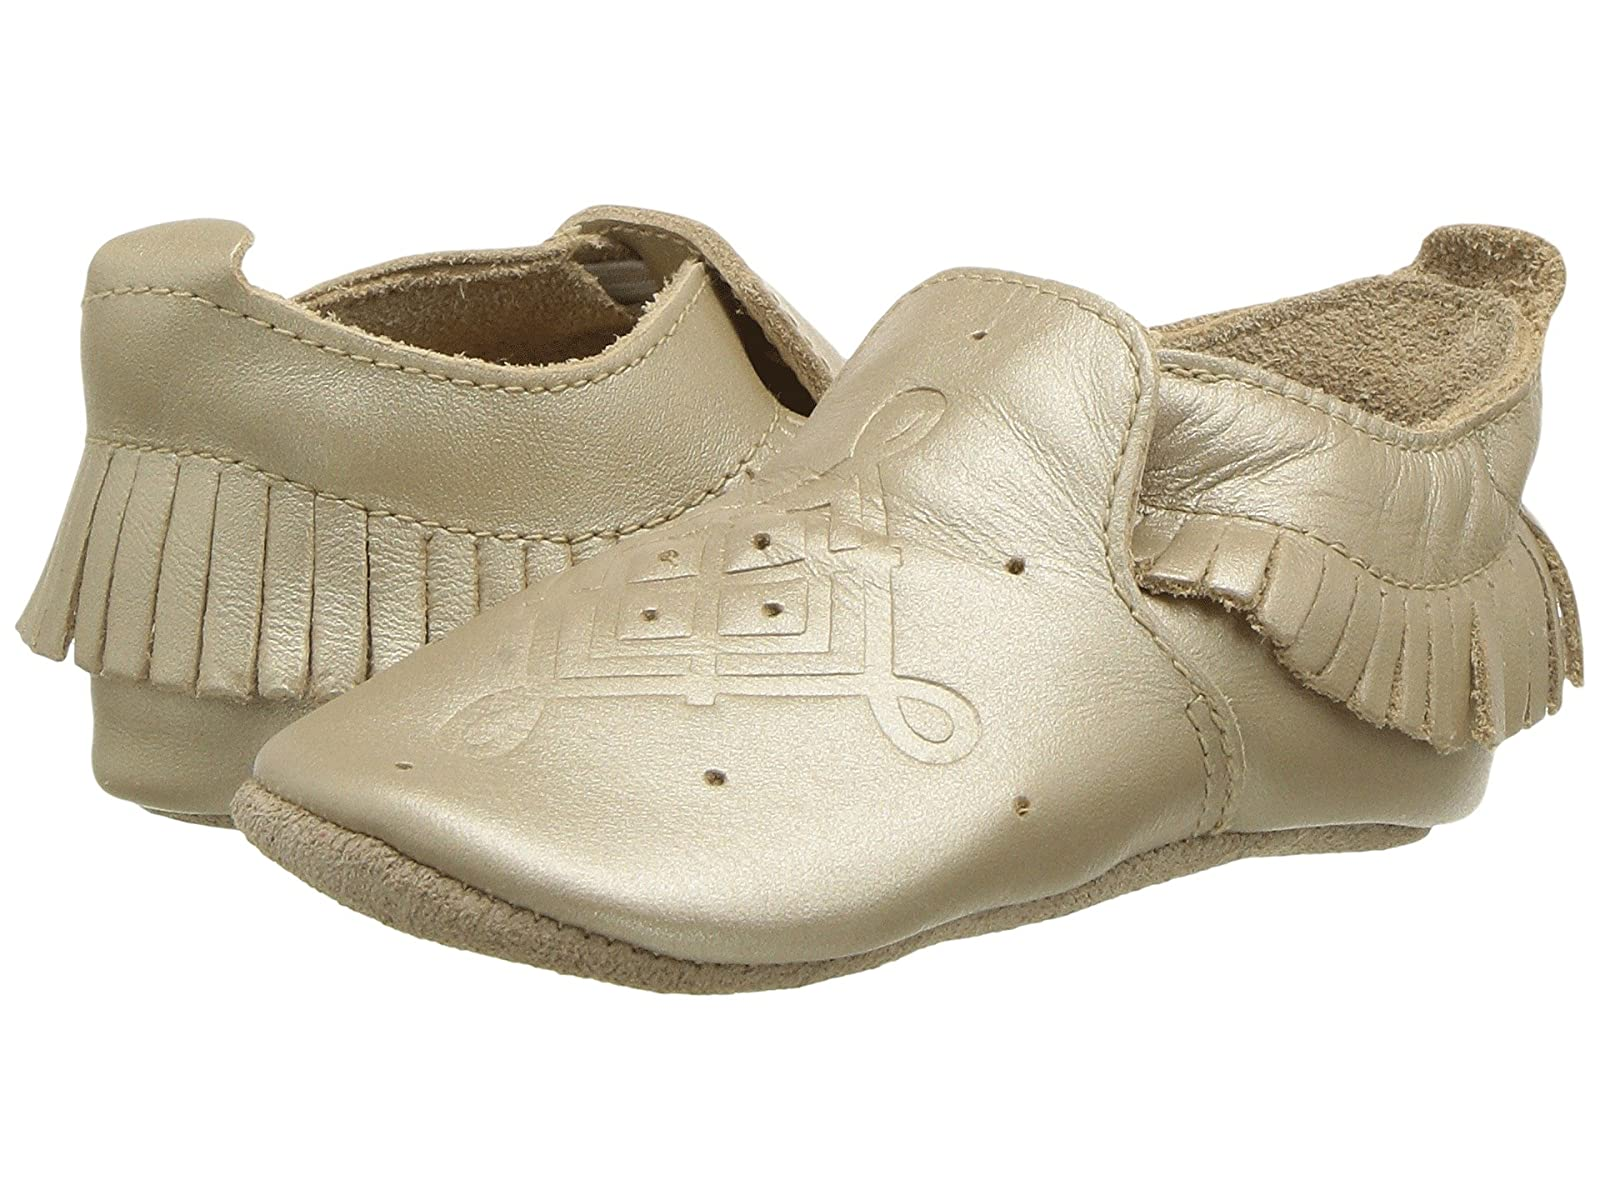 Bobux Kids Soft Sole Moccasin (Infant)Atmospheric grades have affordable shoes